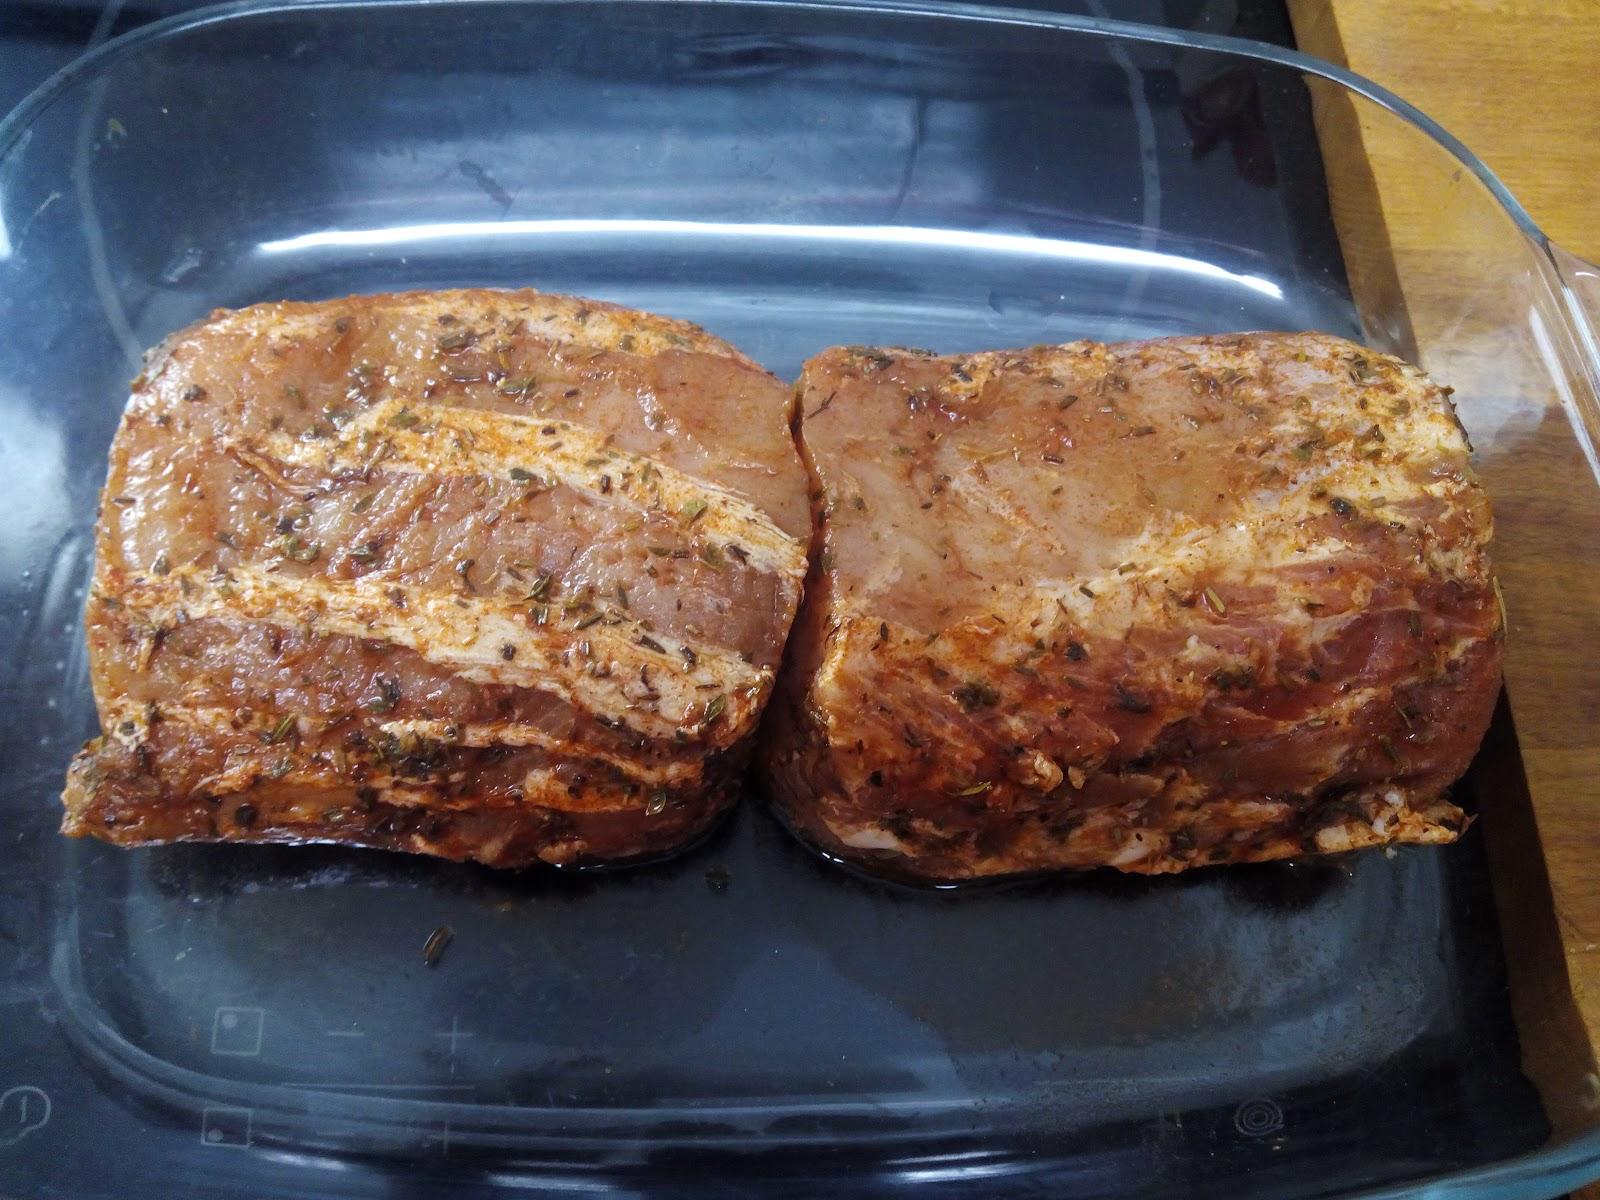 Cocina con rachel lomo adobado al horno con patatas asadas - Racholas cocina ...